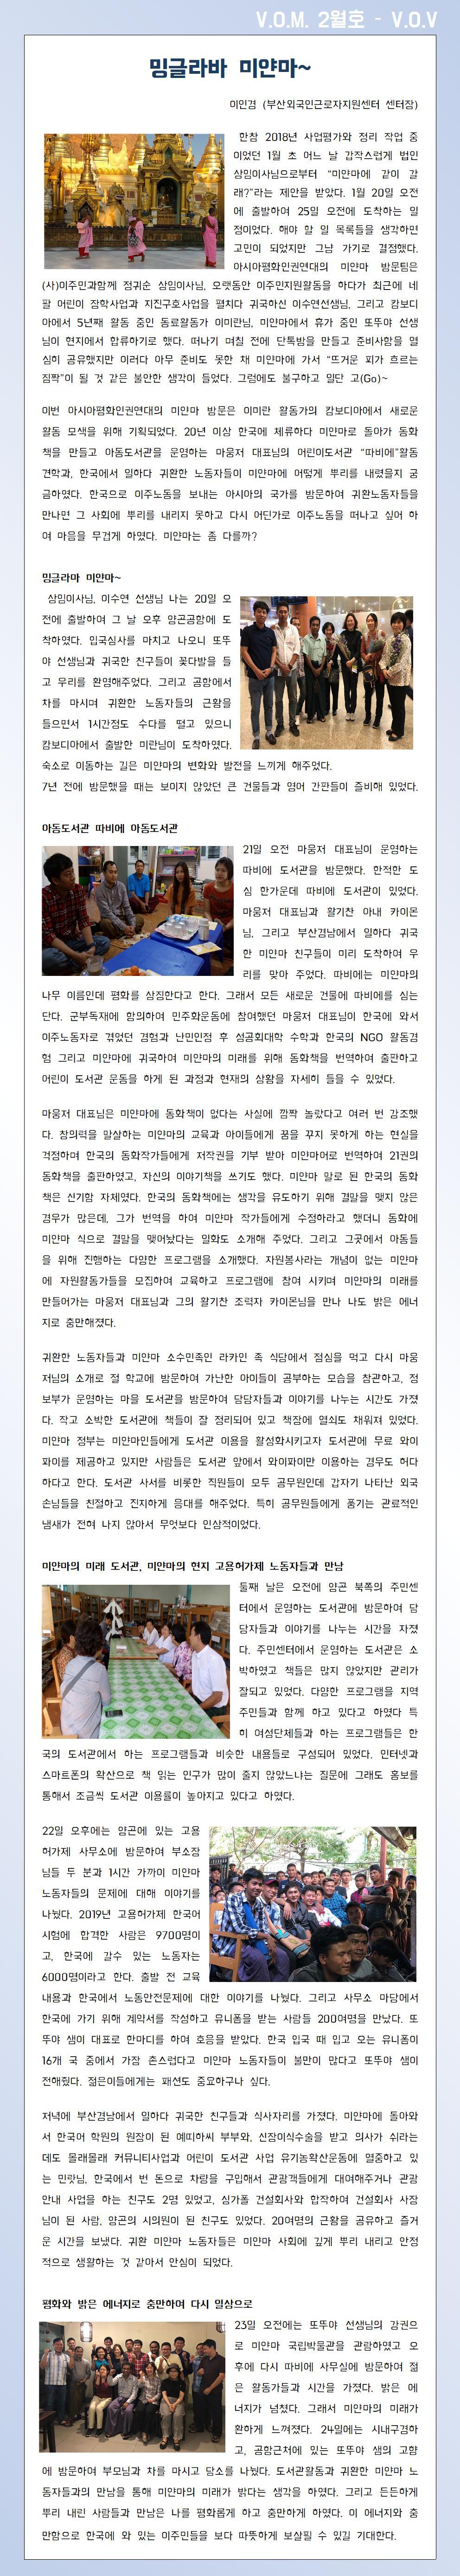 04. VOV-밍글라바 미얀마(수정)001